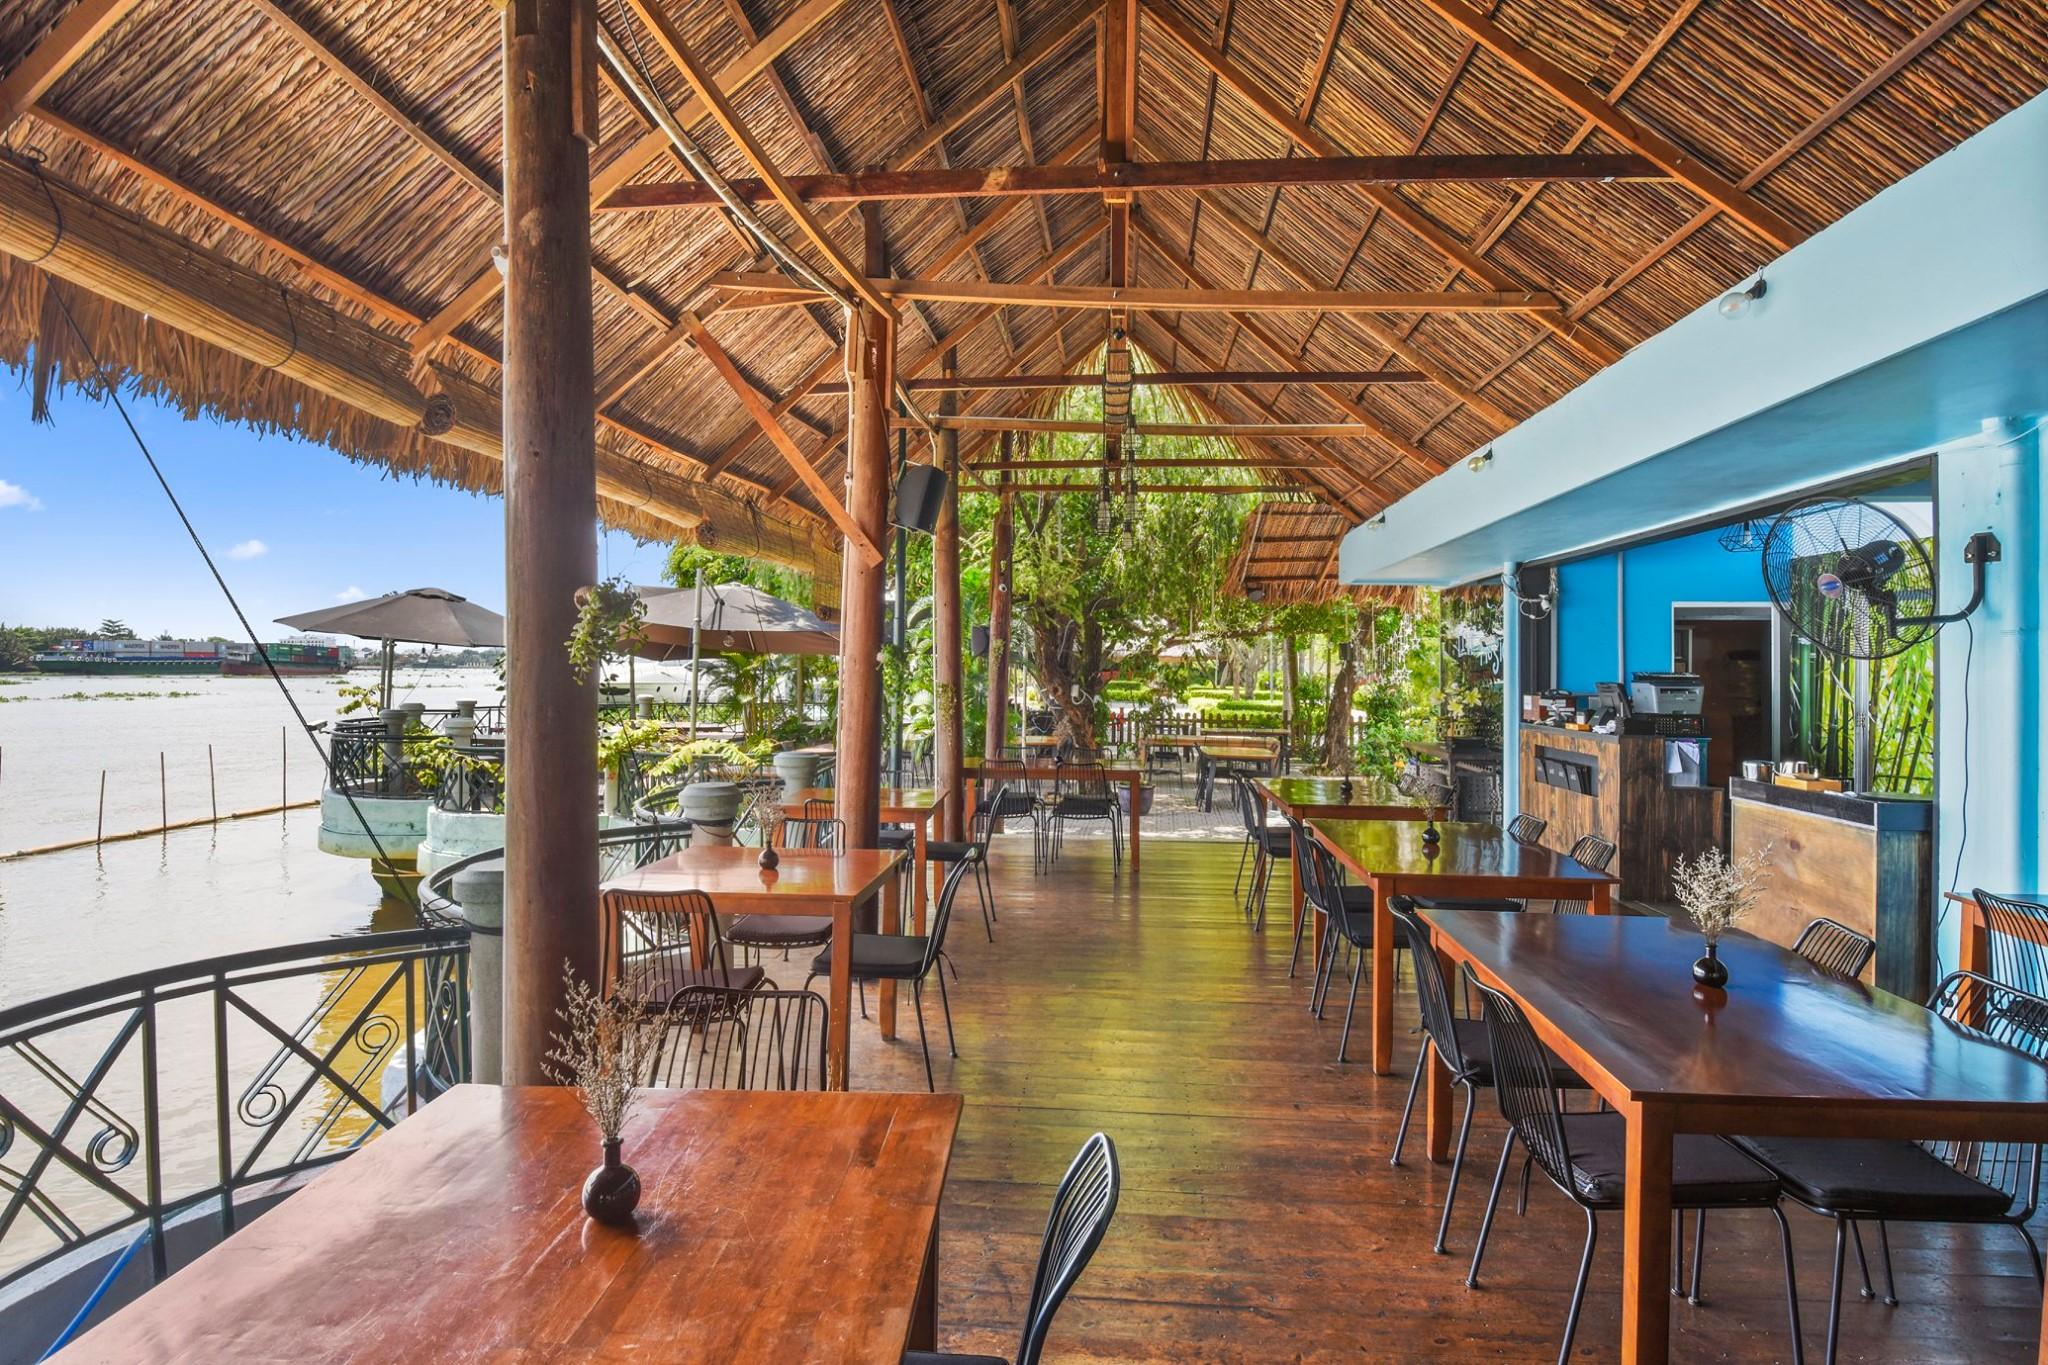 Saigon riverside restaurants_boat house